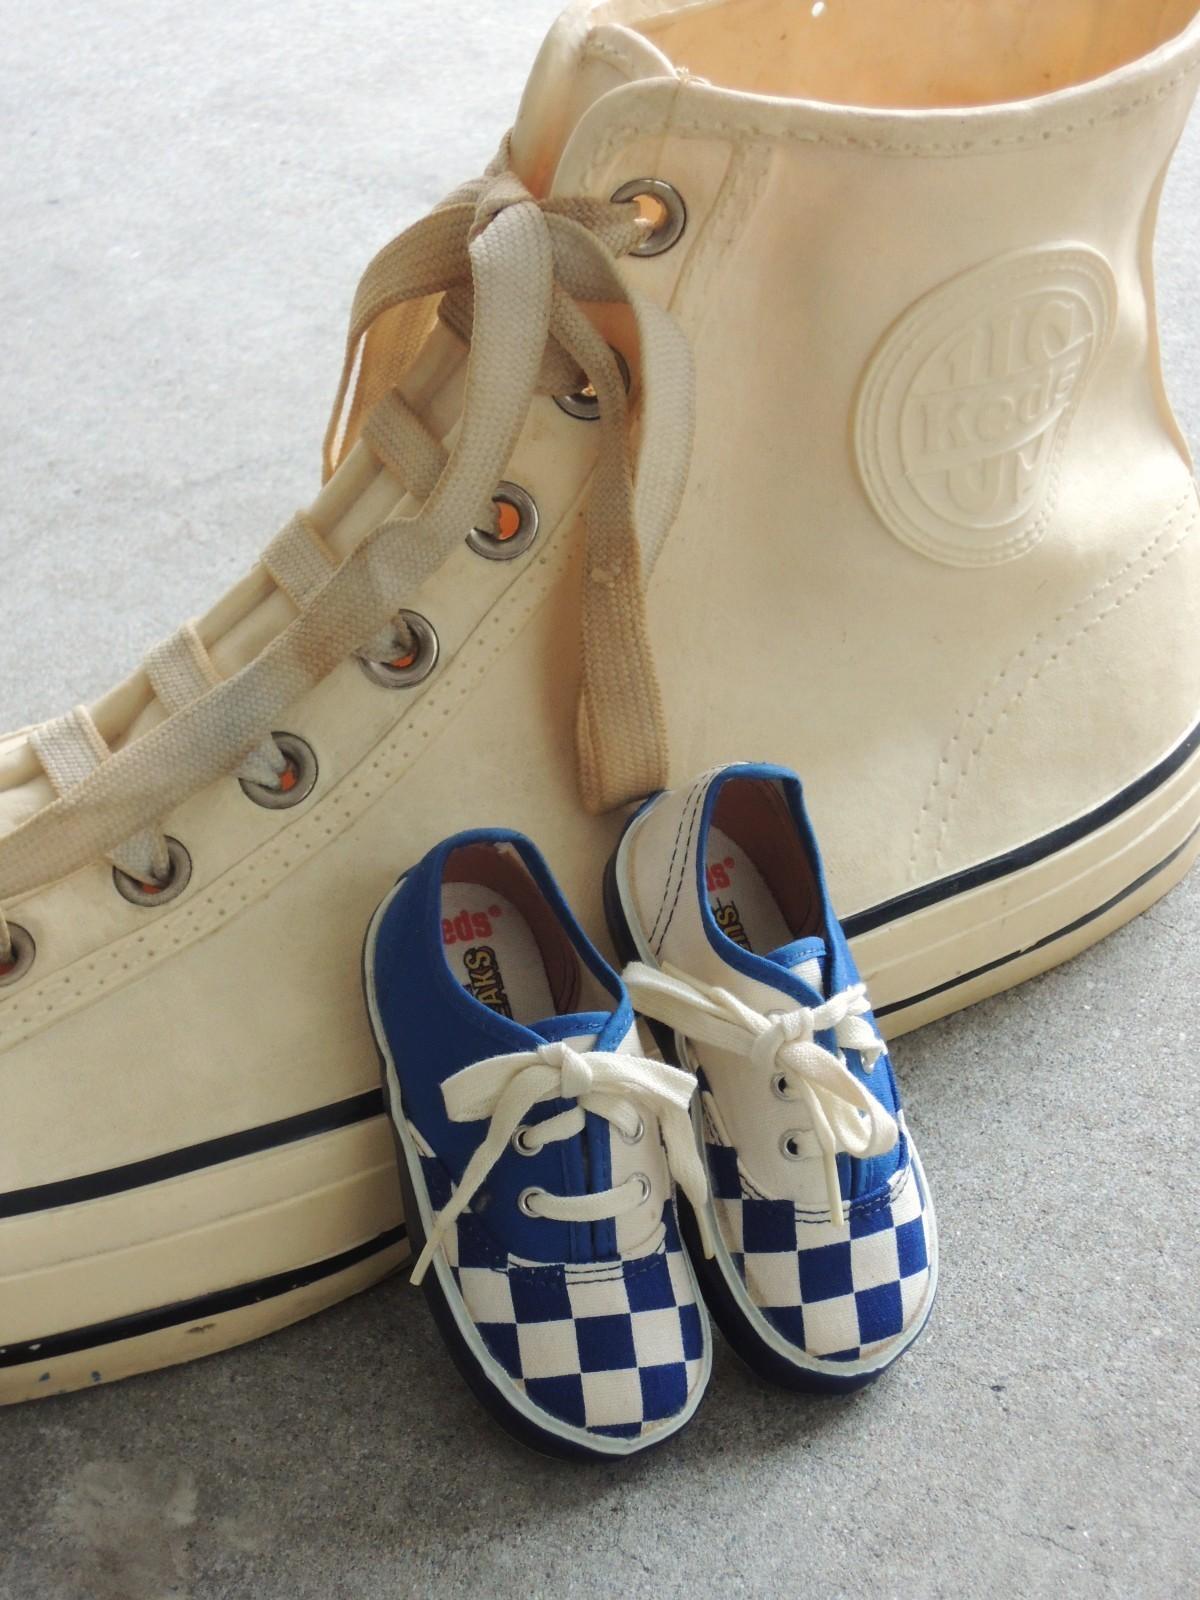 kedssupersneaker01.JPG